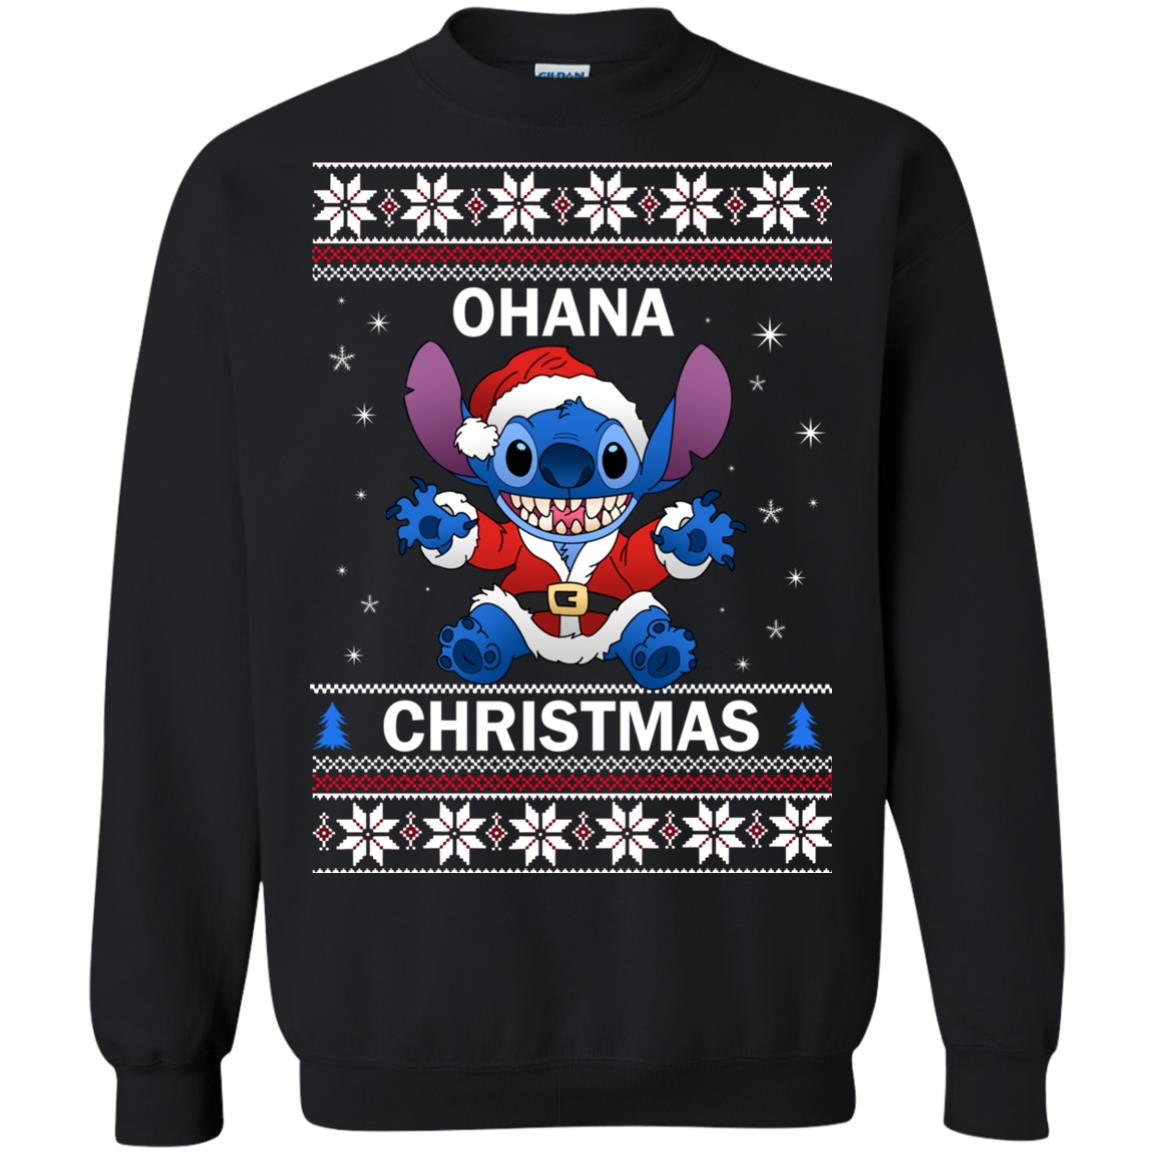 image 4845 - Stitch Ohana Christmas ugly sweater, shirt, long sleeve